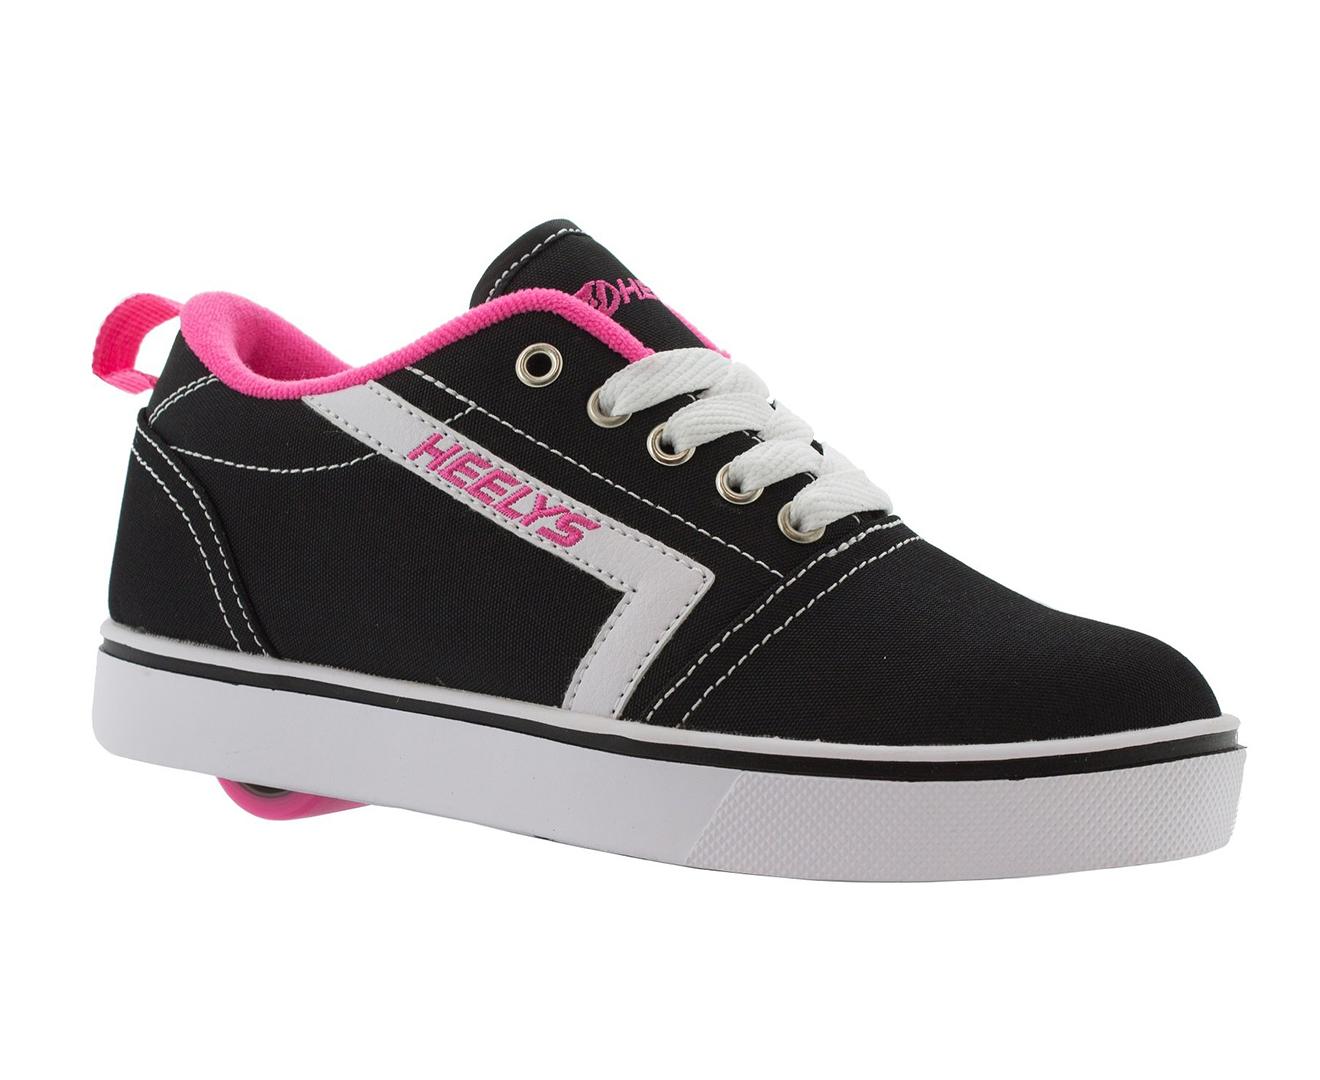 Heelys Girls' GR8 Pro Roller Shoes BlackPink